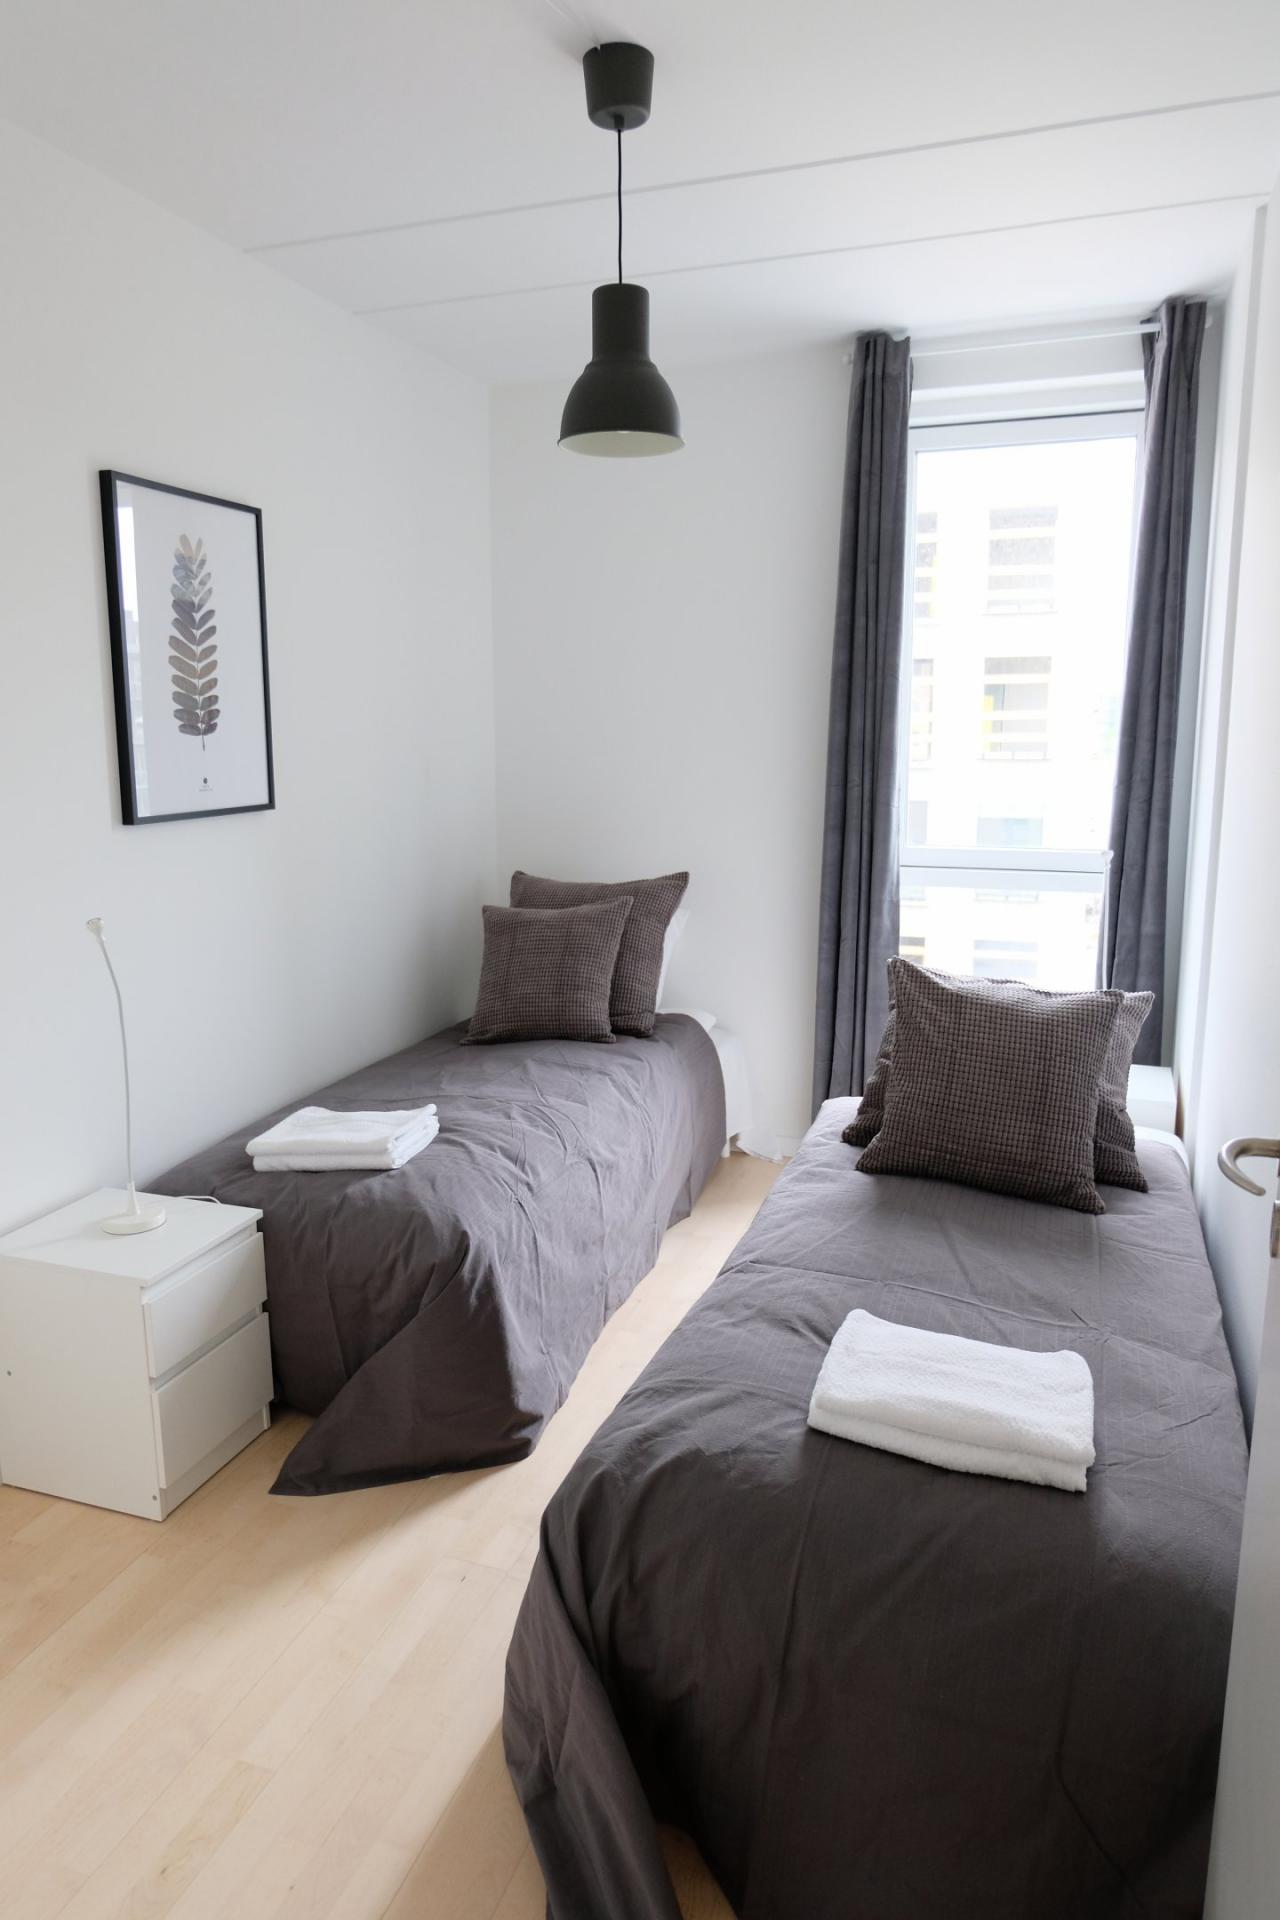 Bedroom at Sluseholmen Apartment, Sydhavnen, Copenhagen